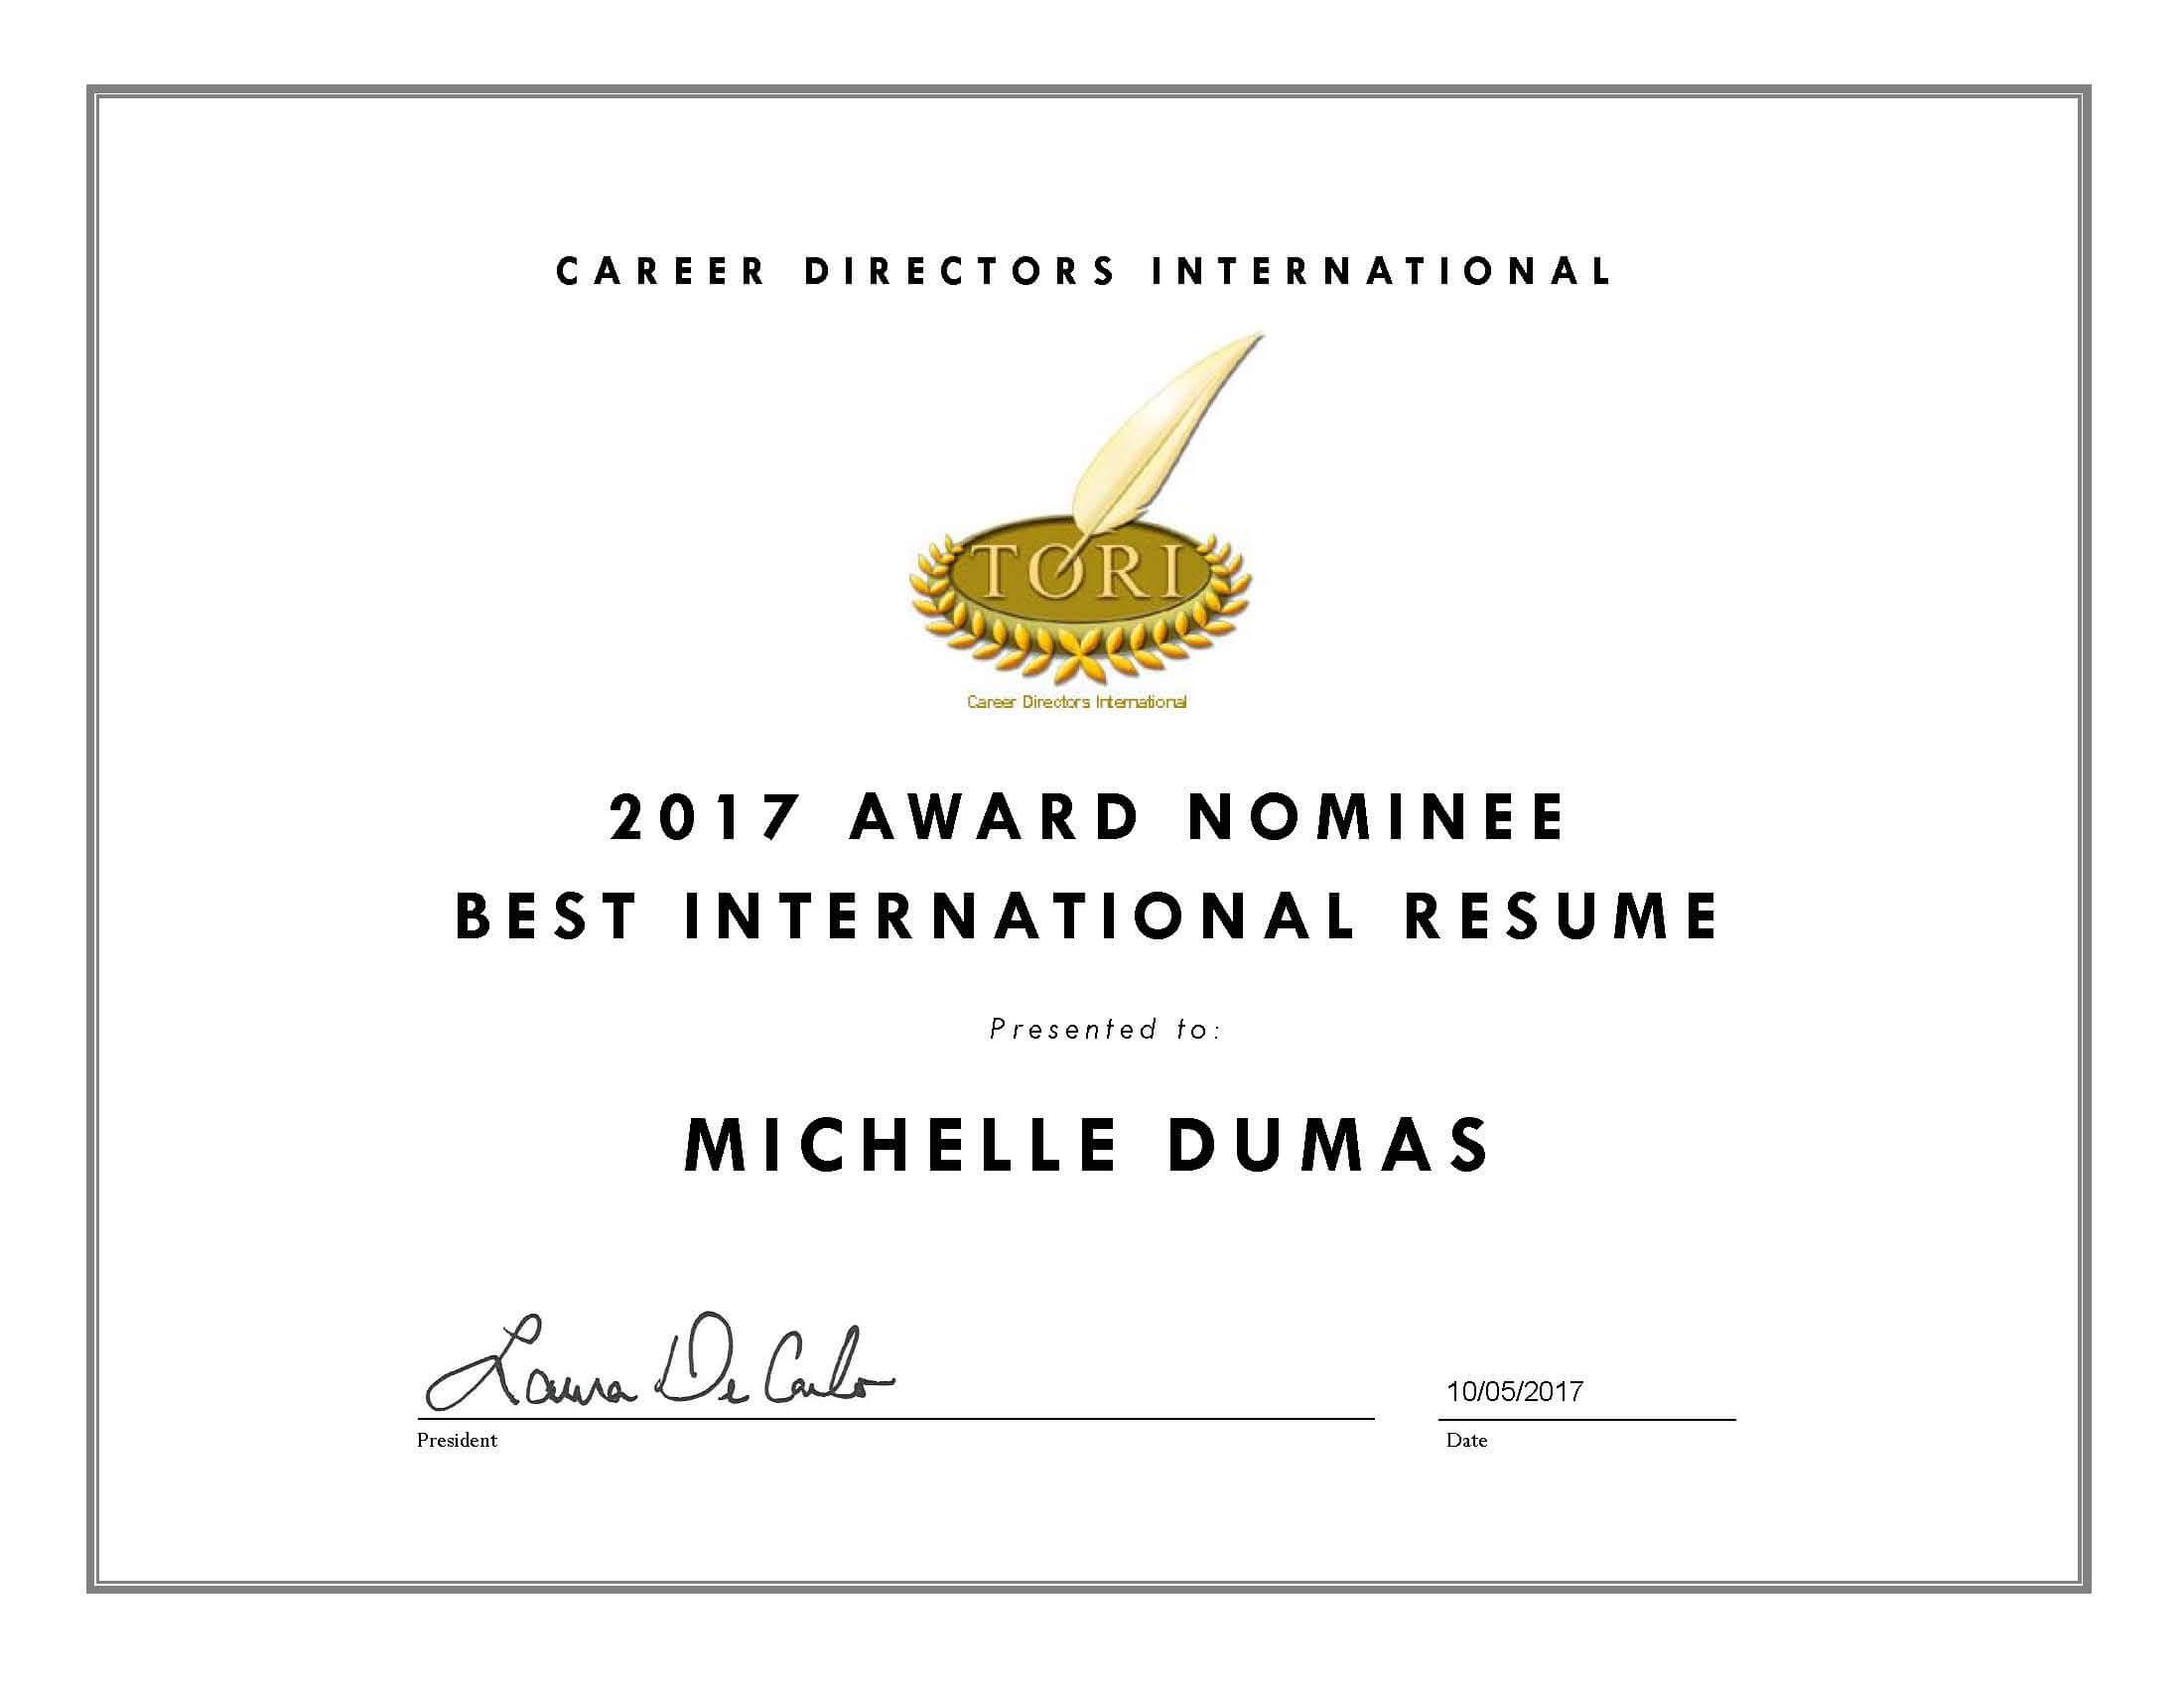 Michelle Dumas TORI Awards Nominee, Best International Resume 2017